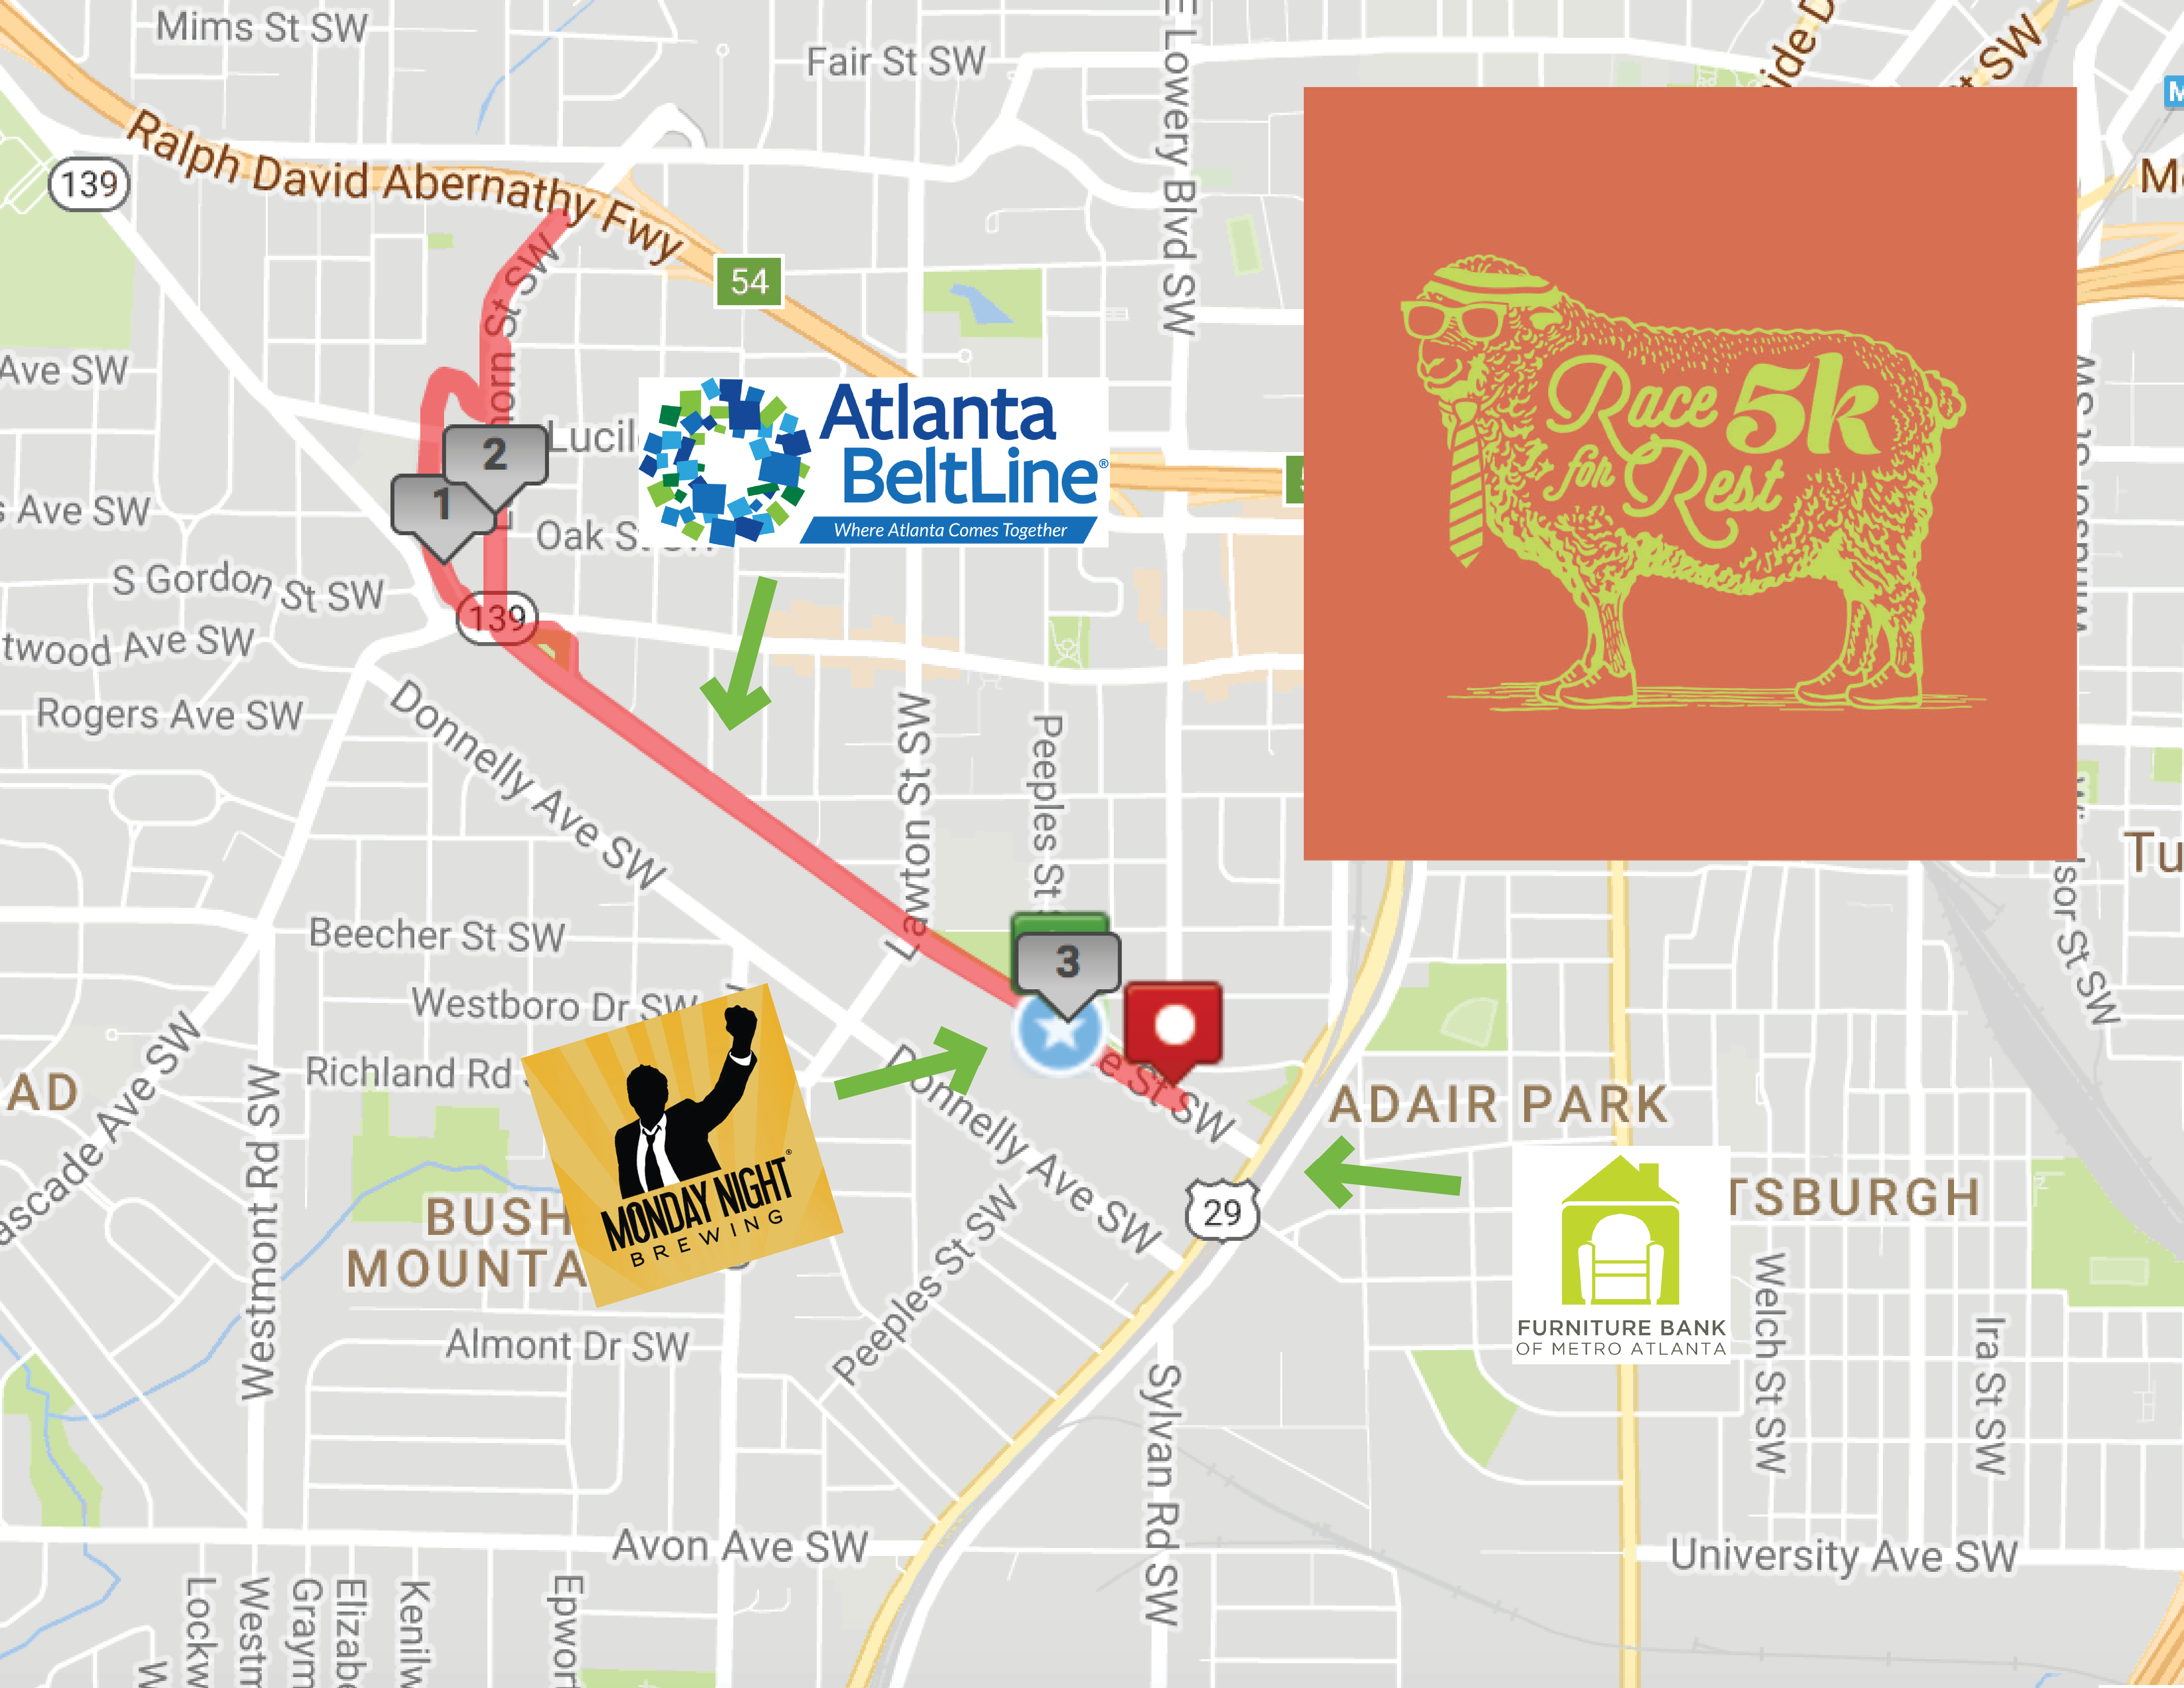 Wonderful 2017 5K Course Map U2022 The Furniture Bank Of Metro Atlanta The Furniture Bank  Of Metro Atlanta